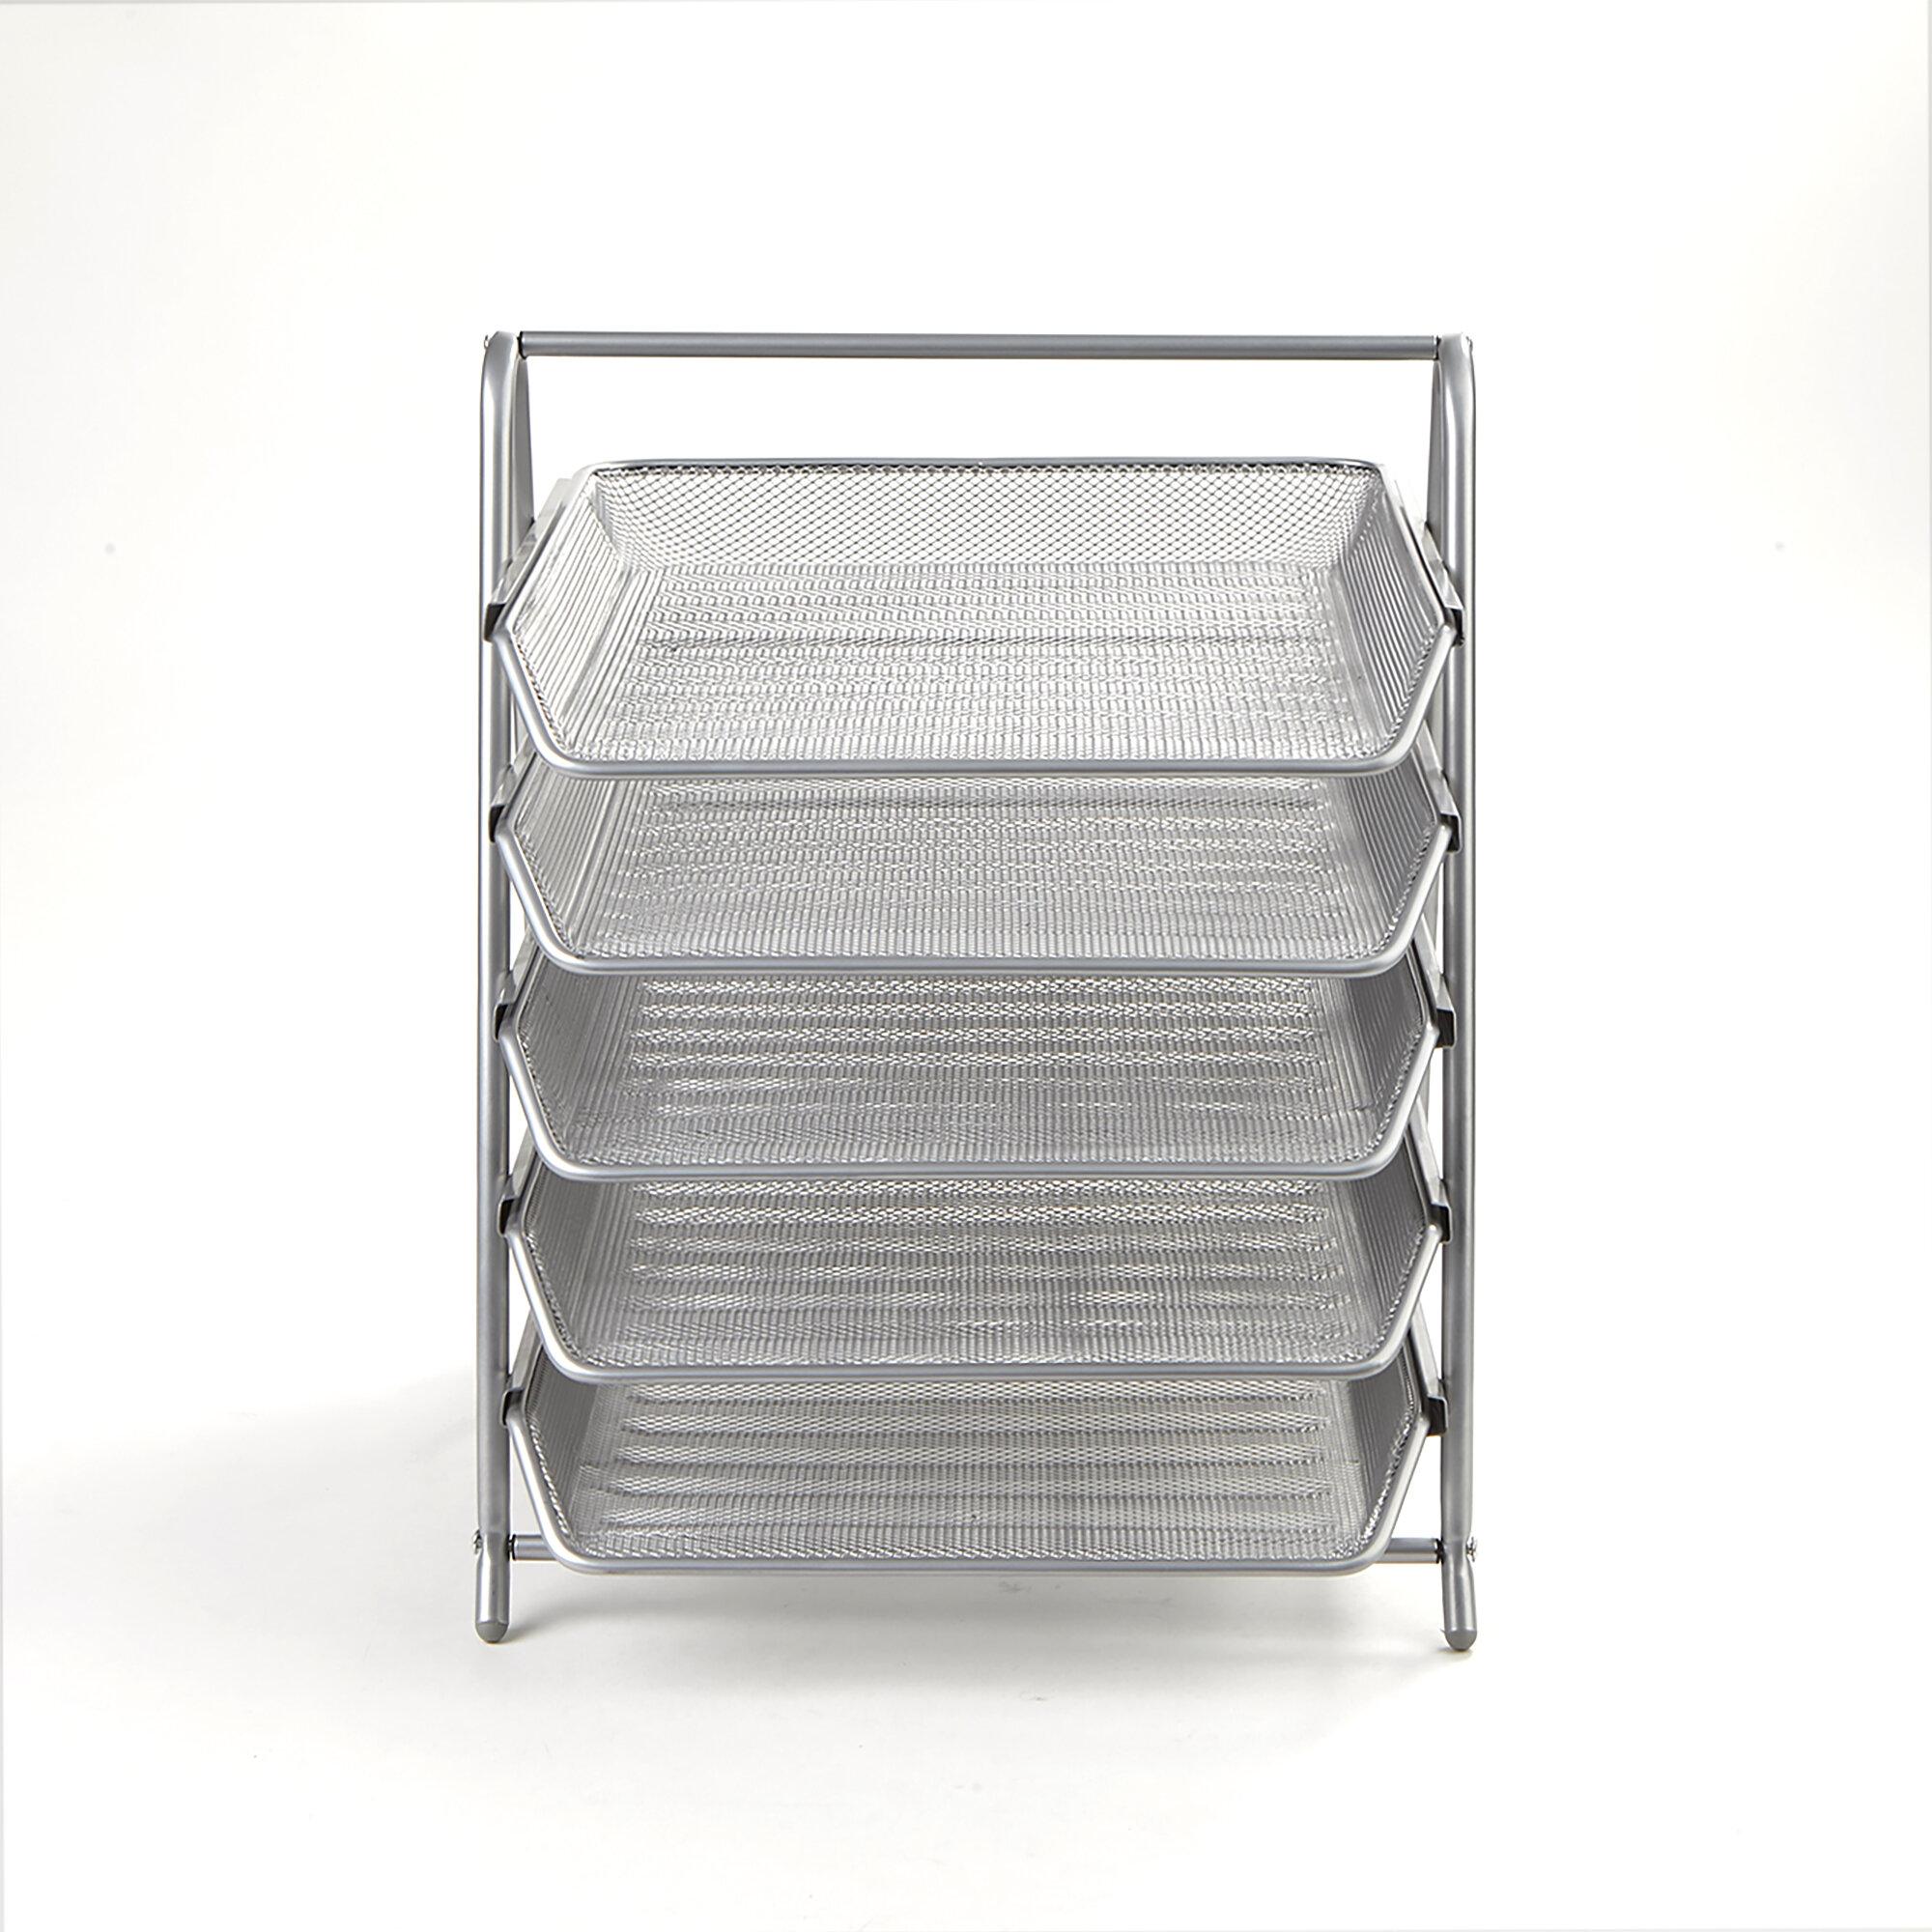 Miraculous 5 Tier Steel Mesh Paper Tray Desk Organizer Home Remodeling Inspirations Cosmcuboardxyz